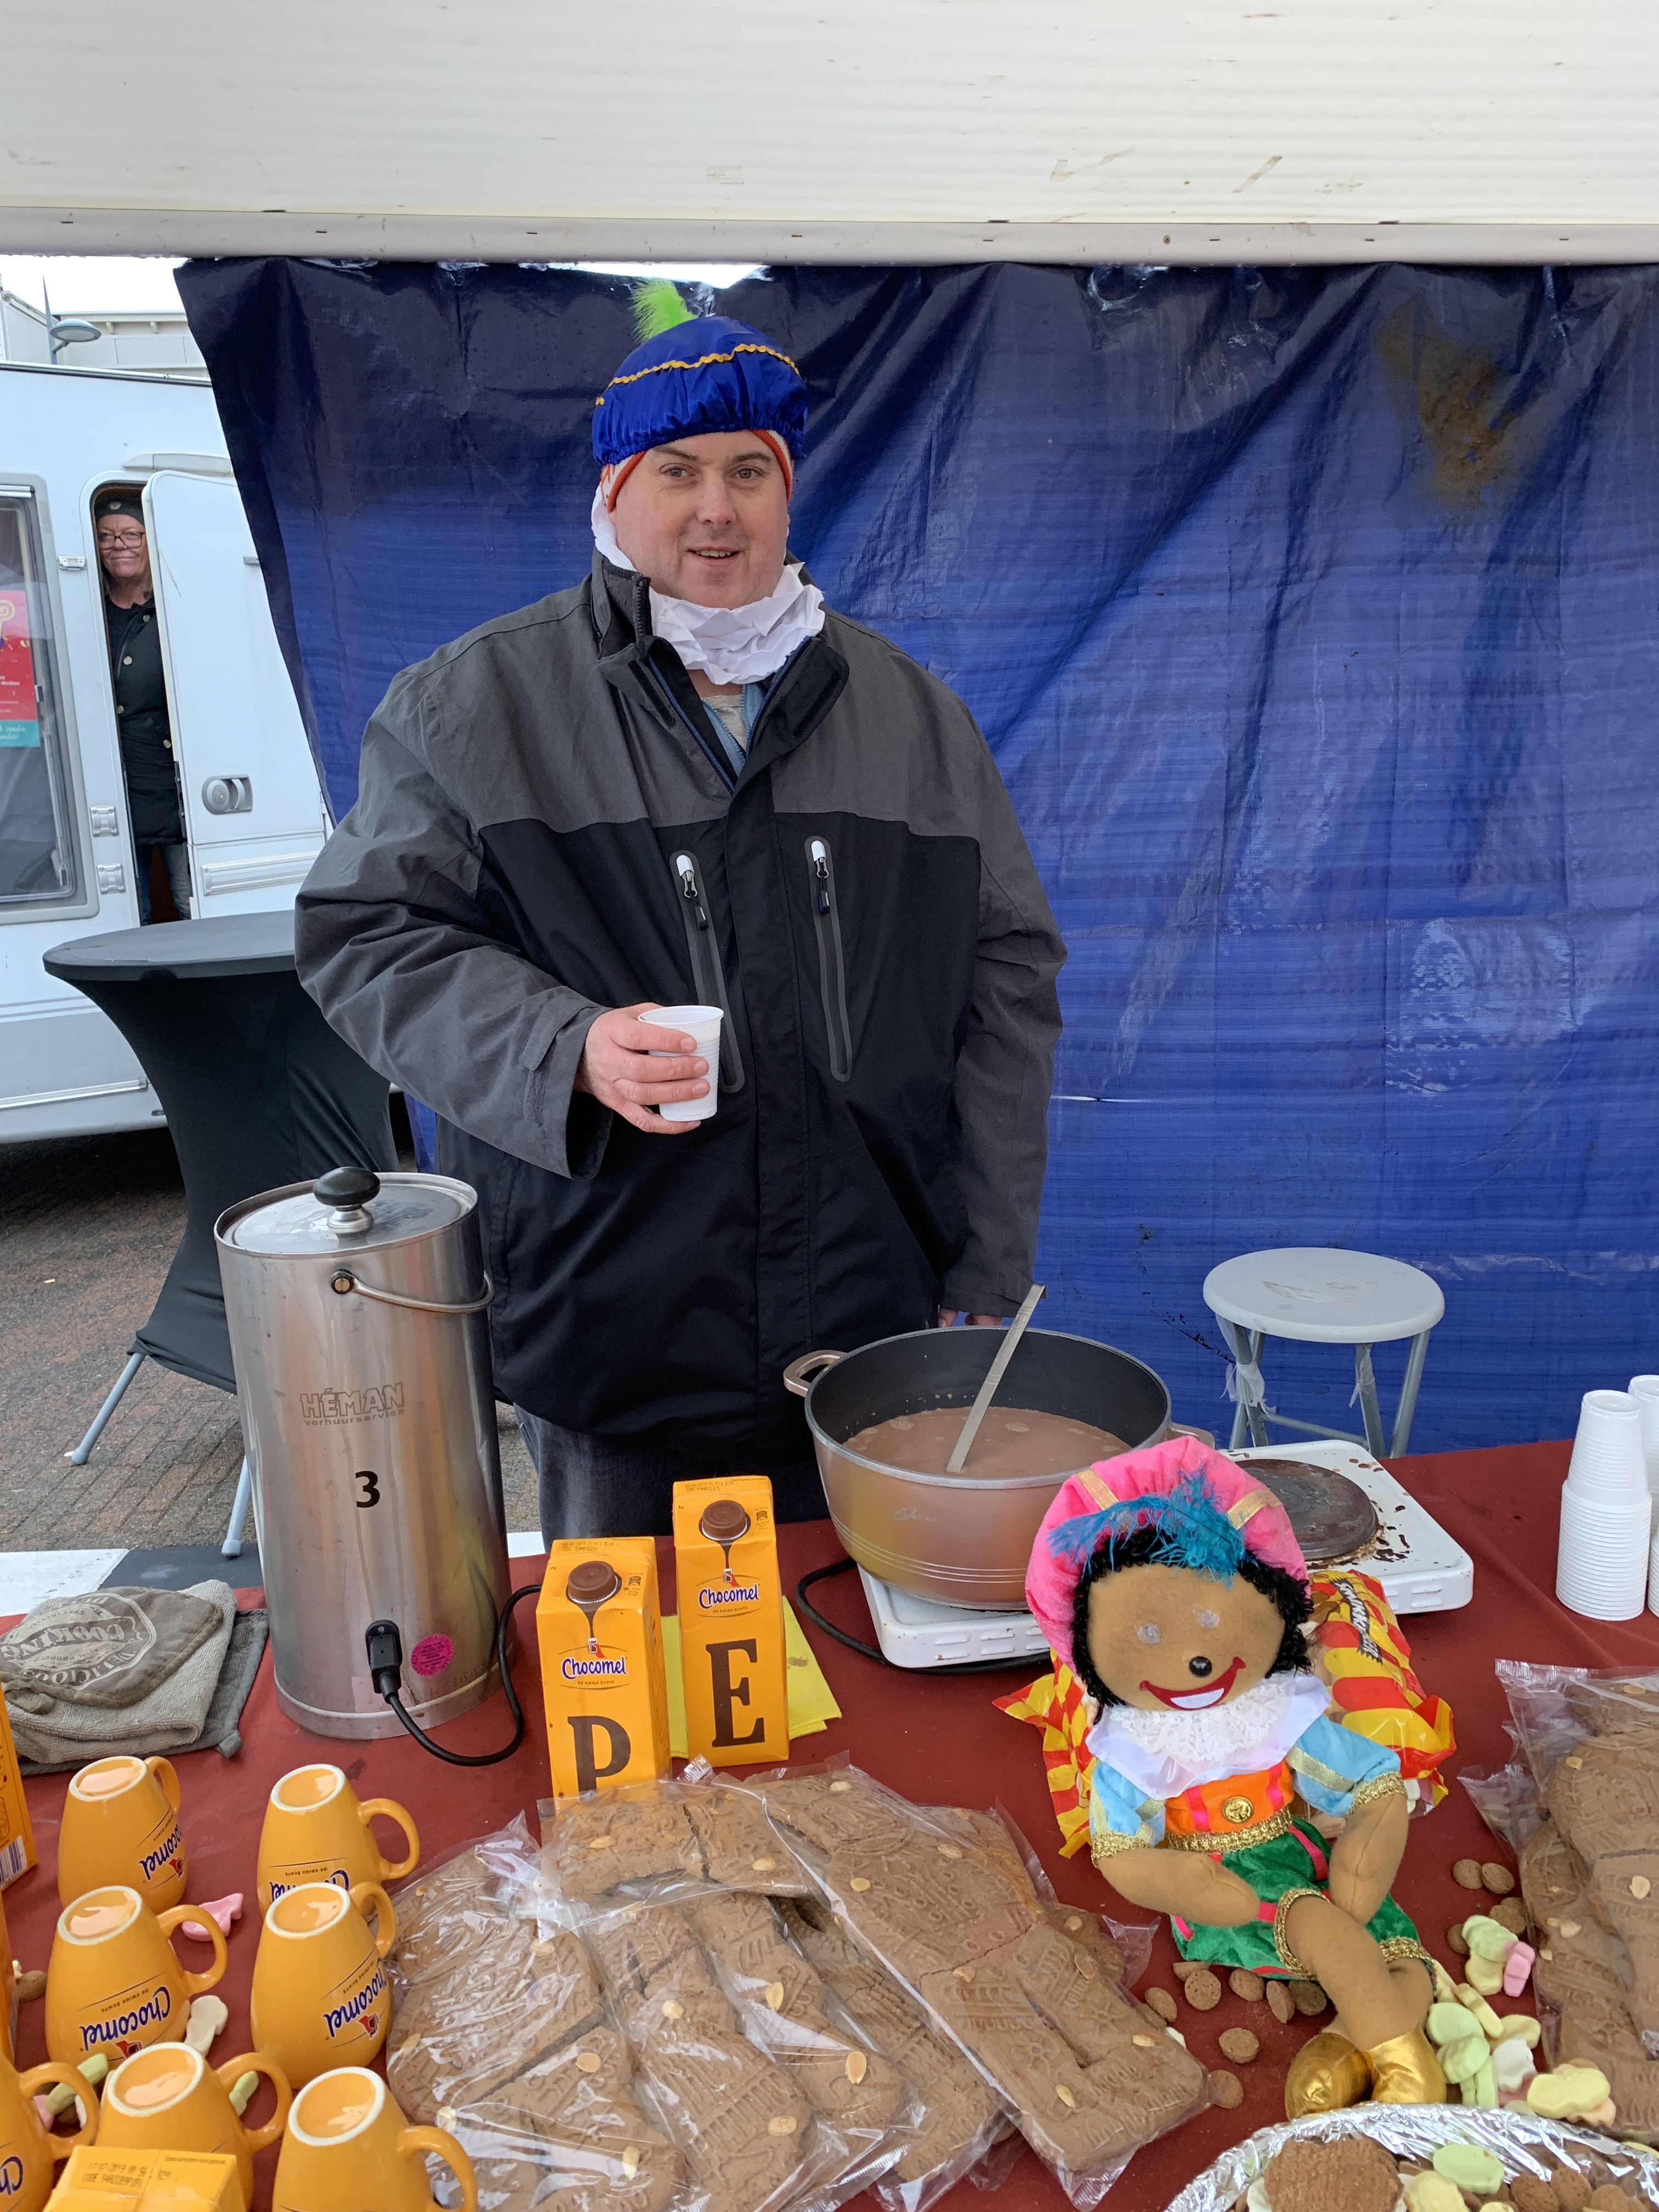 Met Sinterklaas op de foto. (Foto: YvdD) rodi.nl © rodi